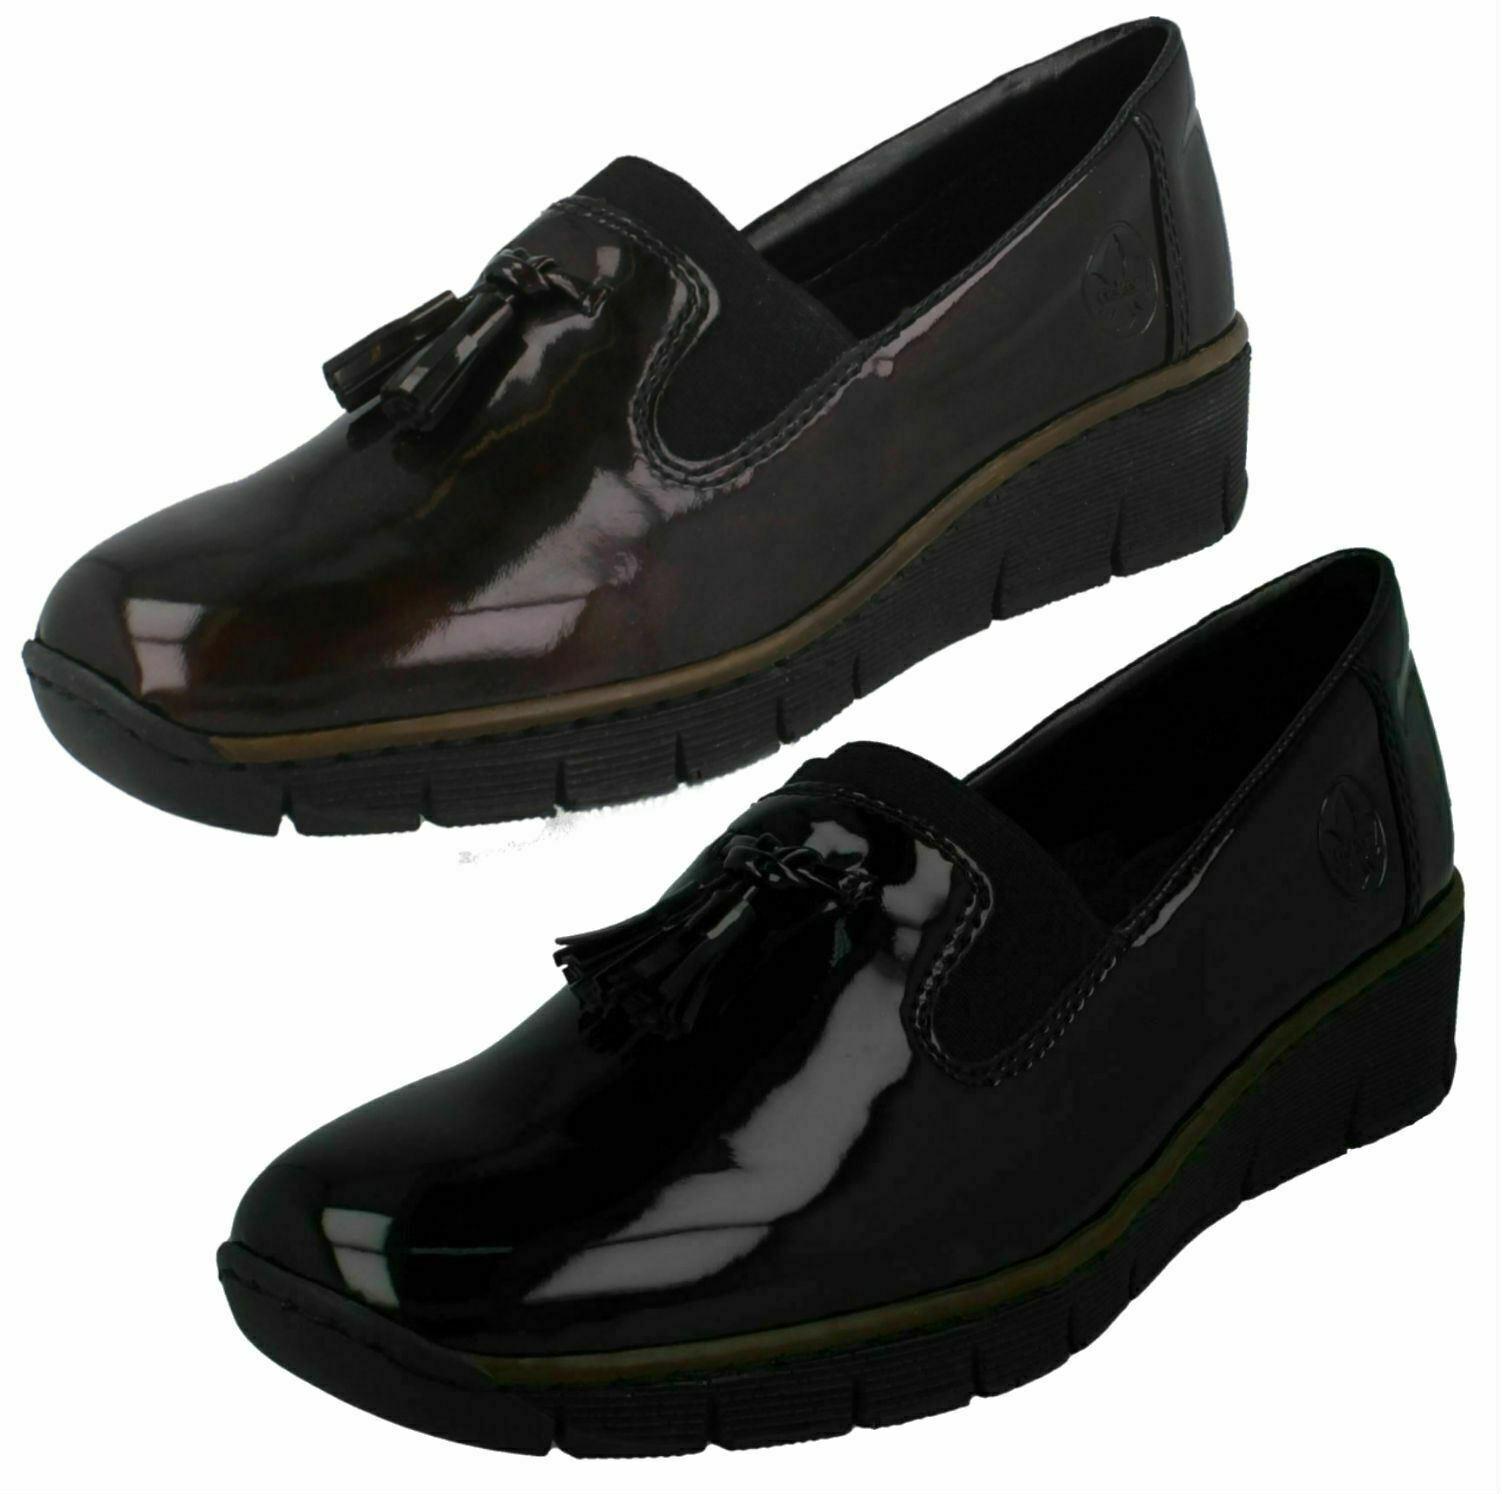 Womens rieker Formal Elegant Black tassel detail no laces wedge shoes size